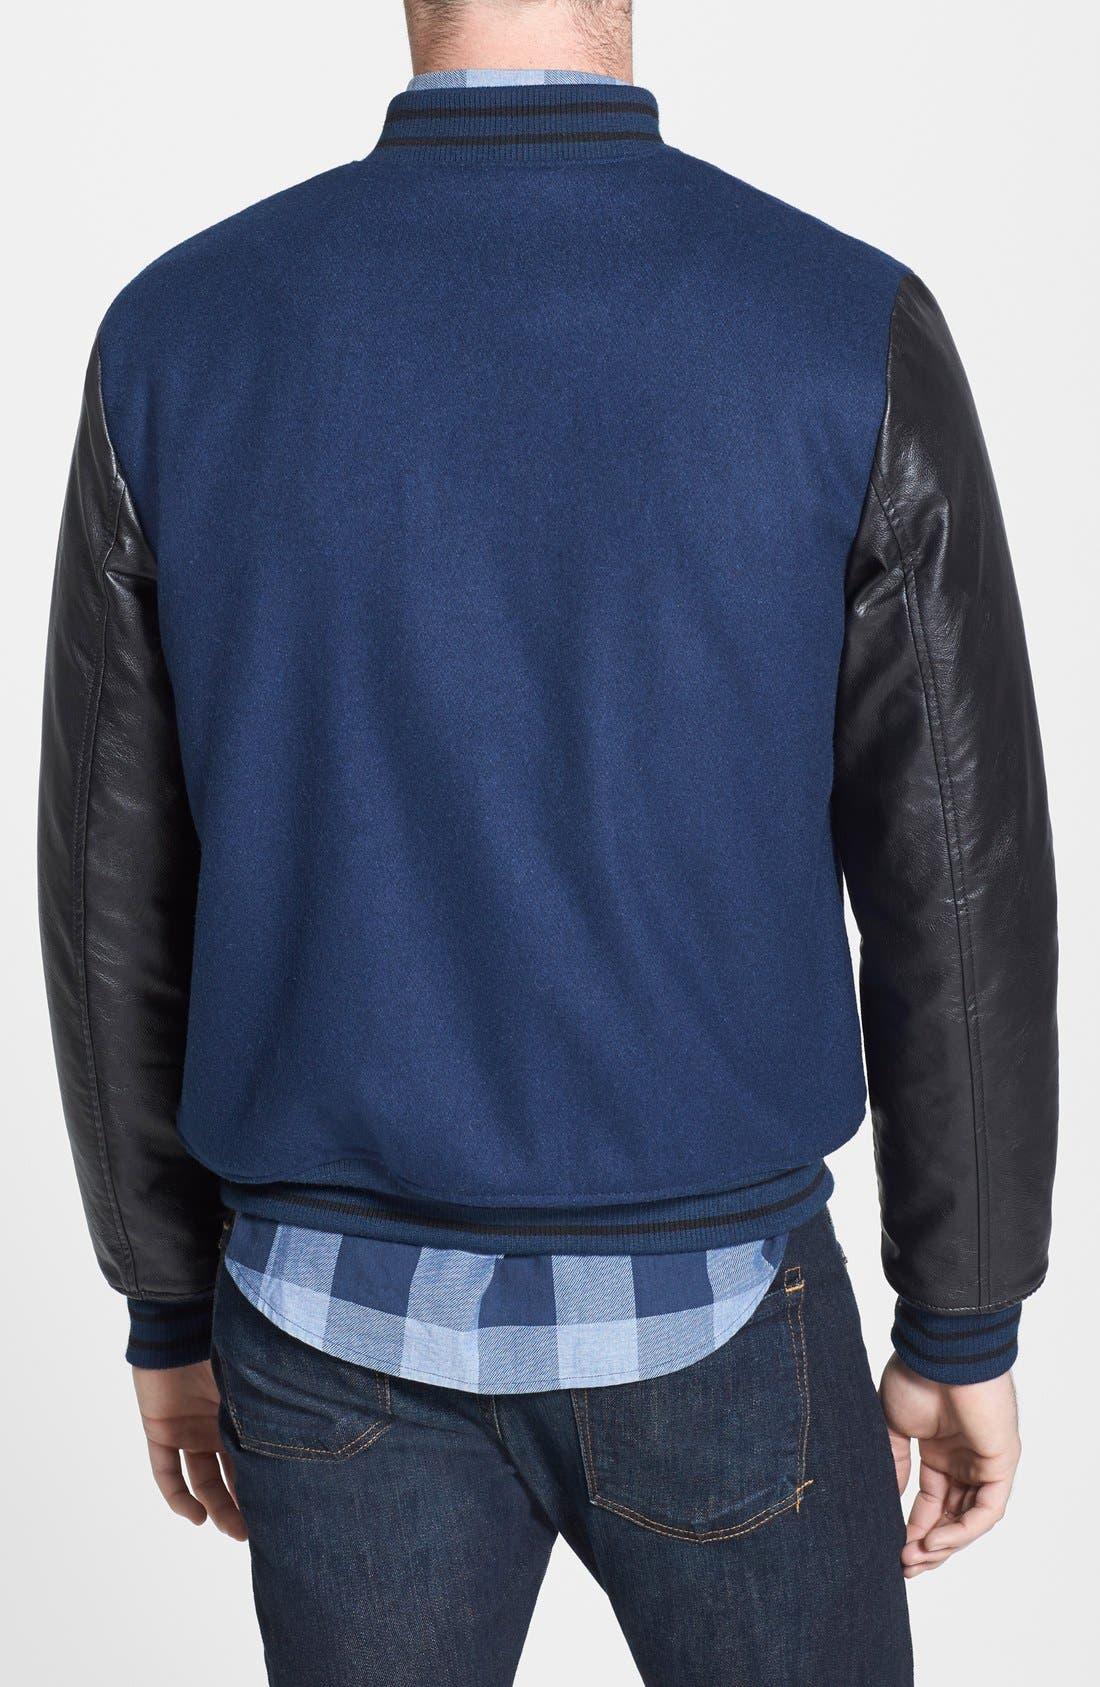 ORIGINAL PENGUIN,                             Vintage Varsity Jacket,                             Alternate thumbnail 3, color,                             411